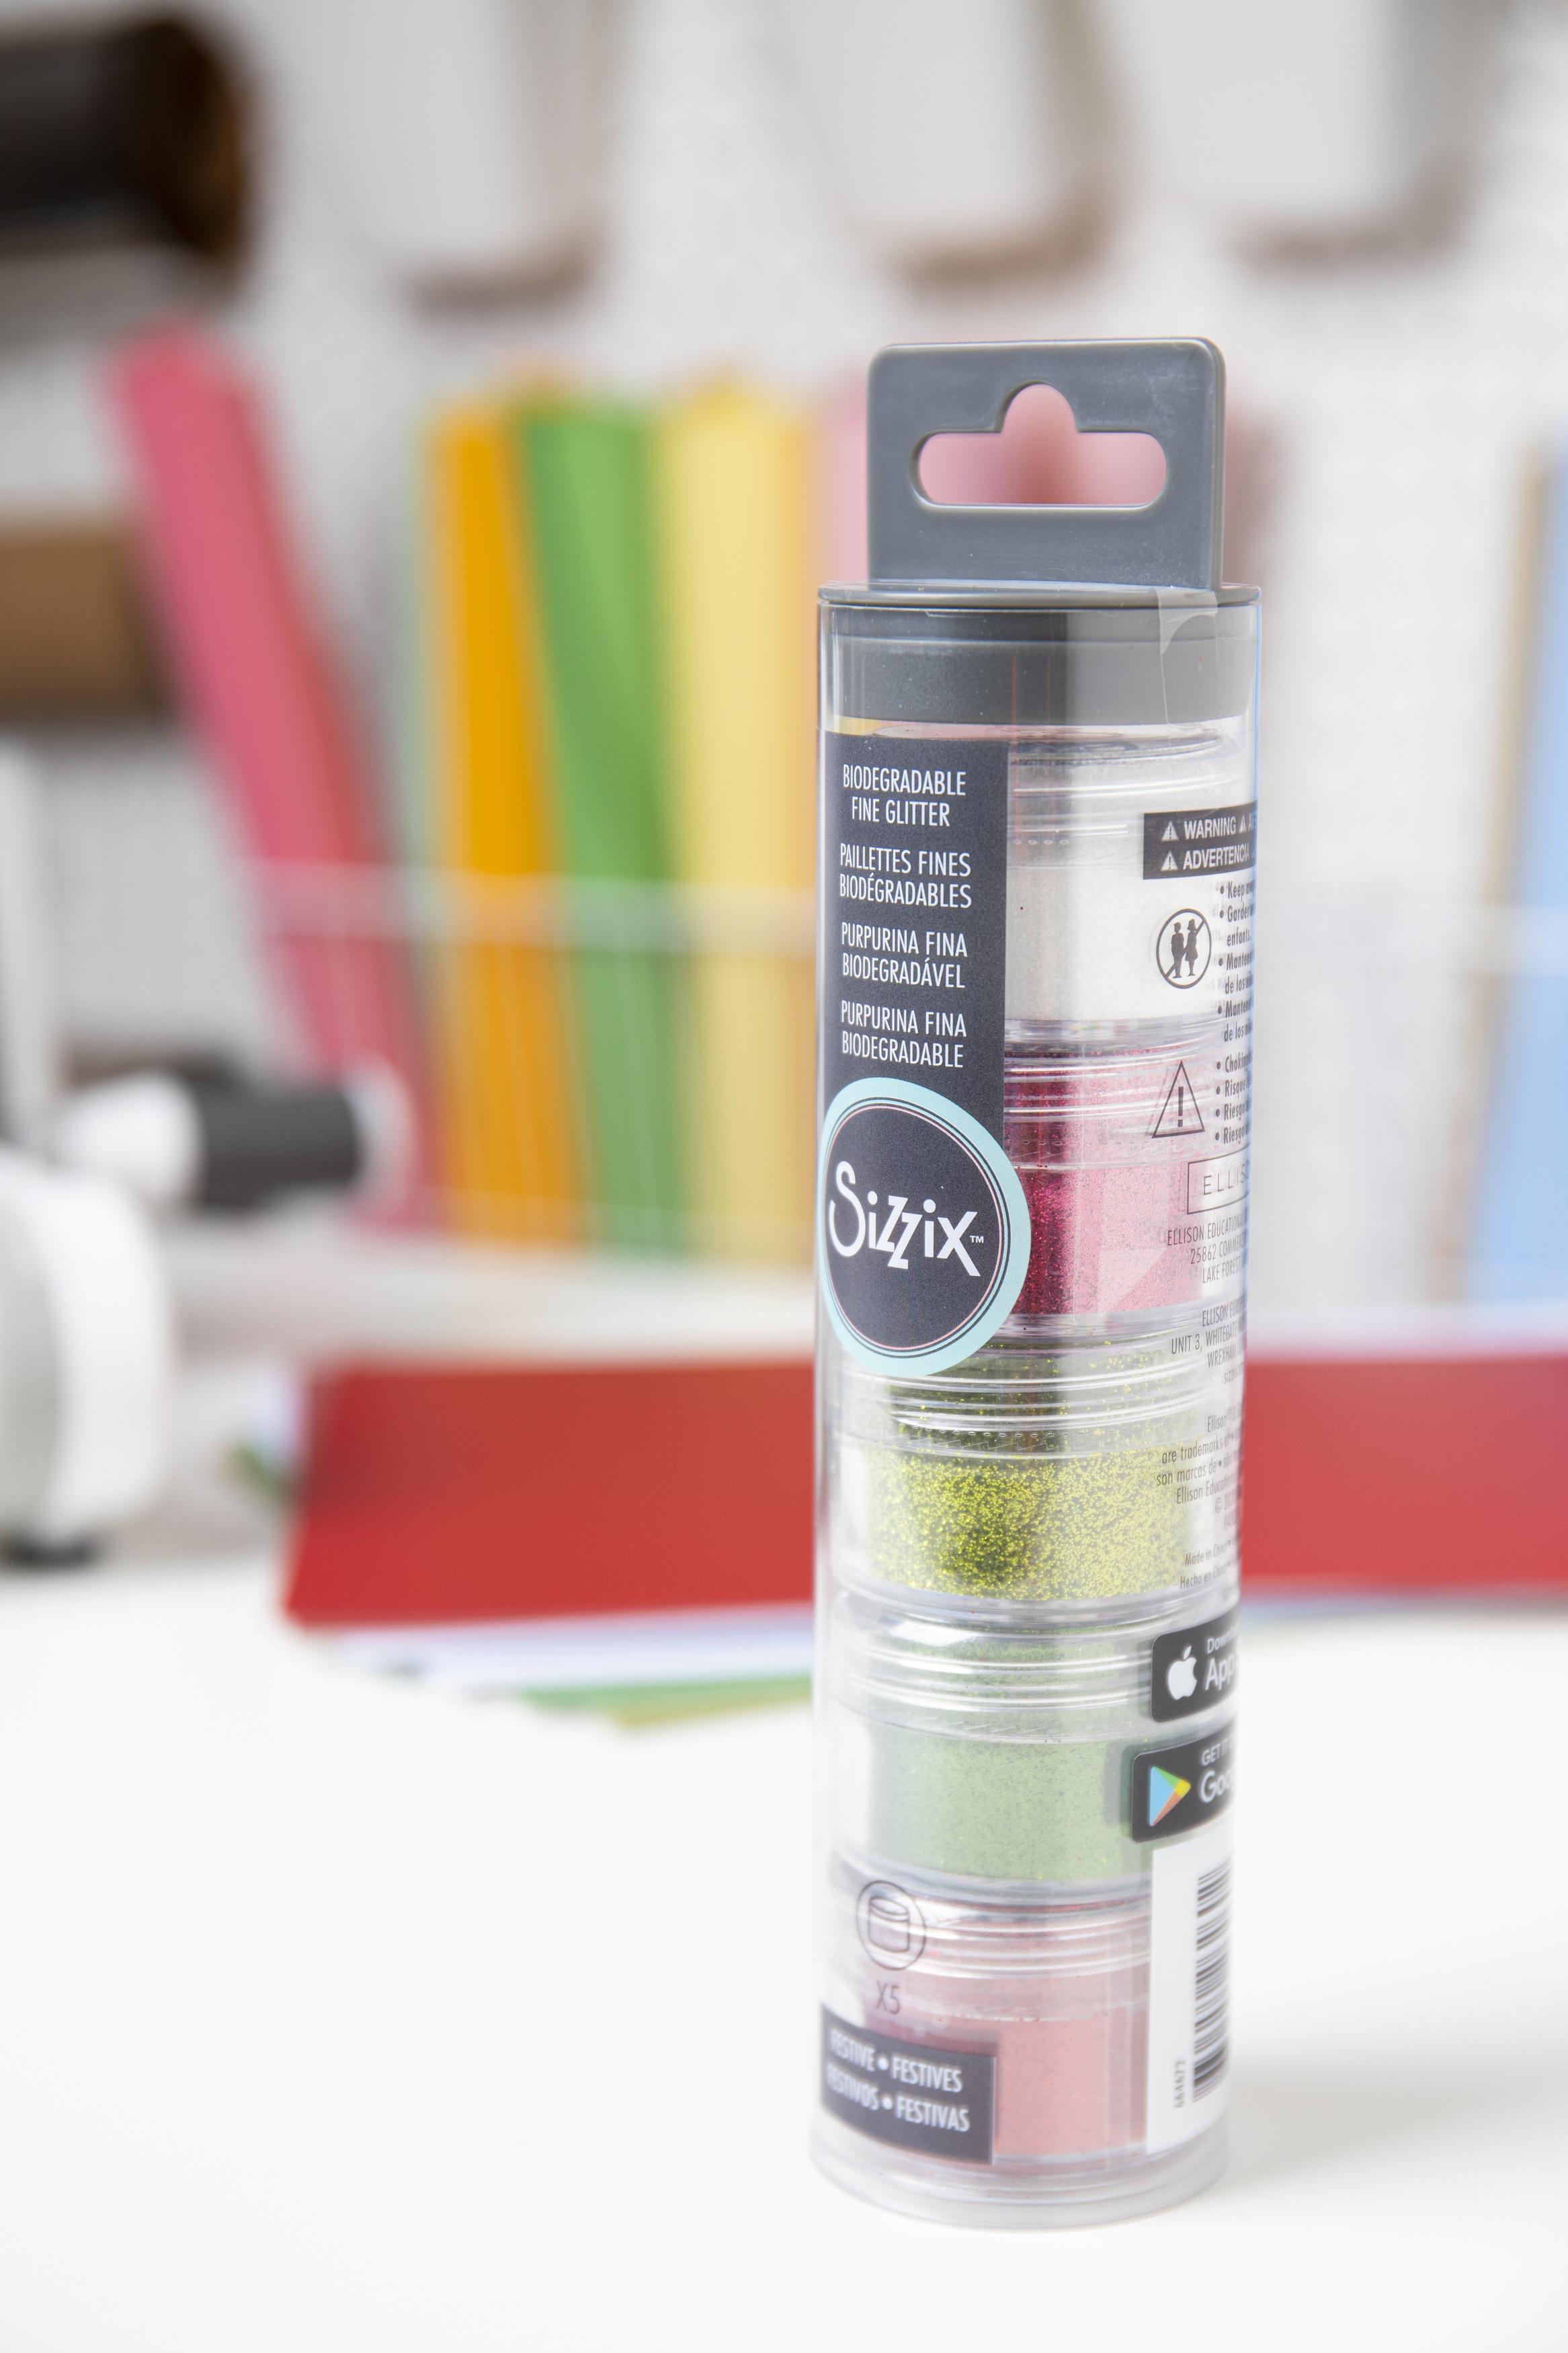 Sizzix Making Essential Biodegradable Fine Glitter 12g-Festive, 5/Pkg